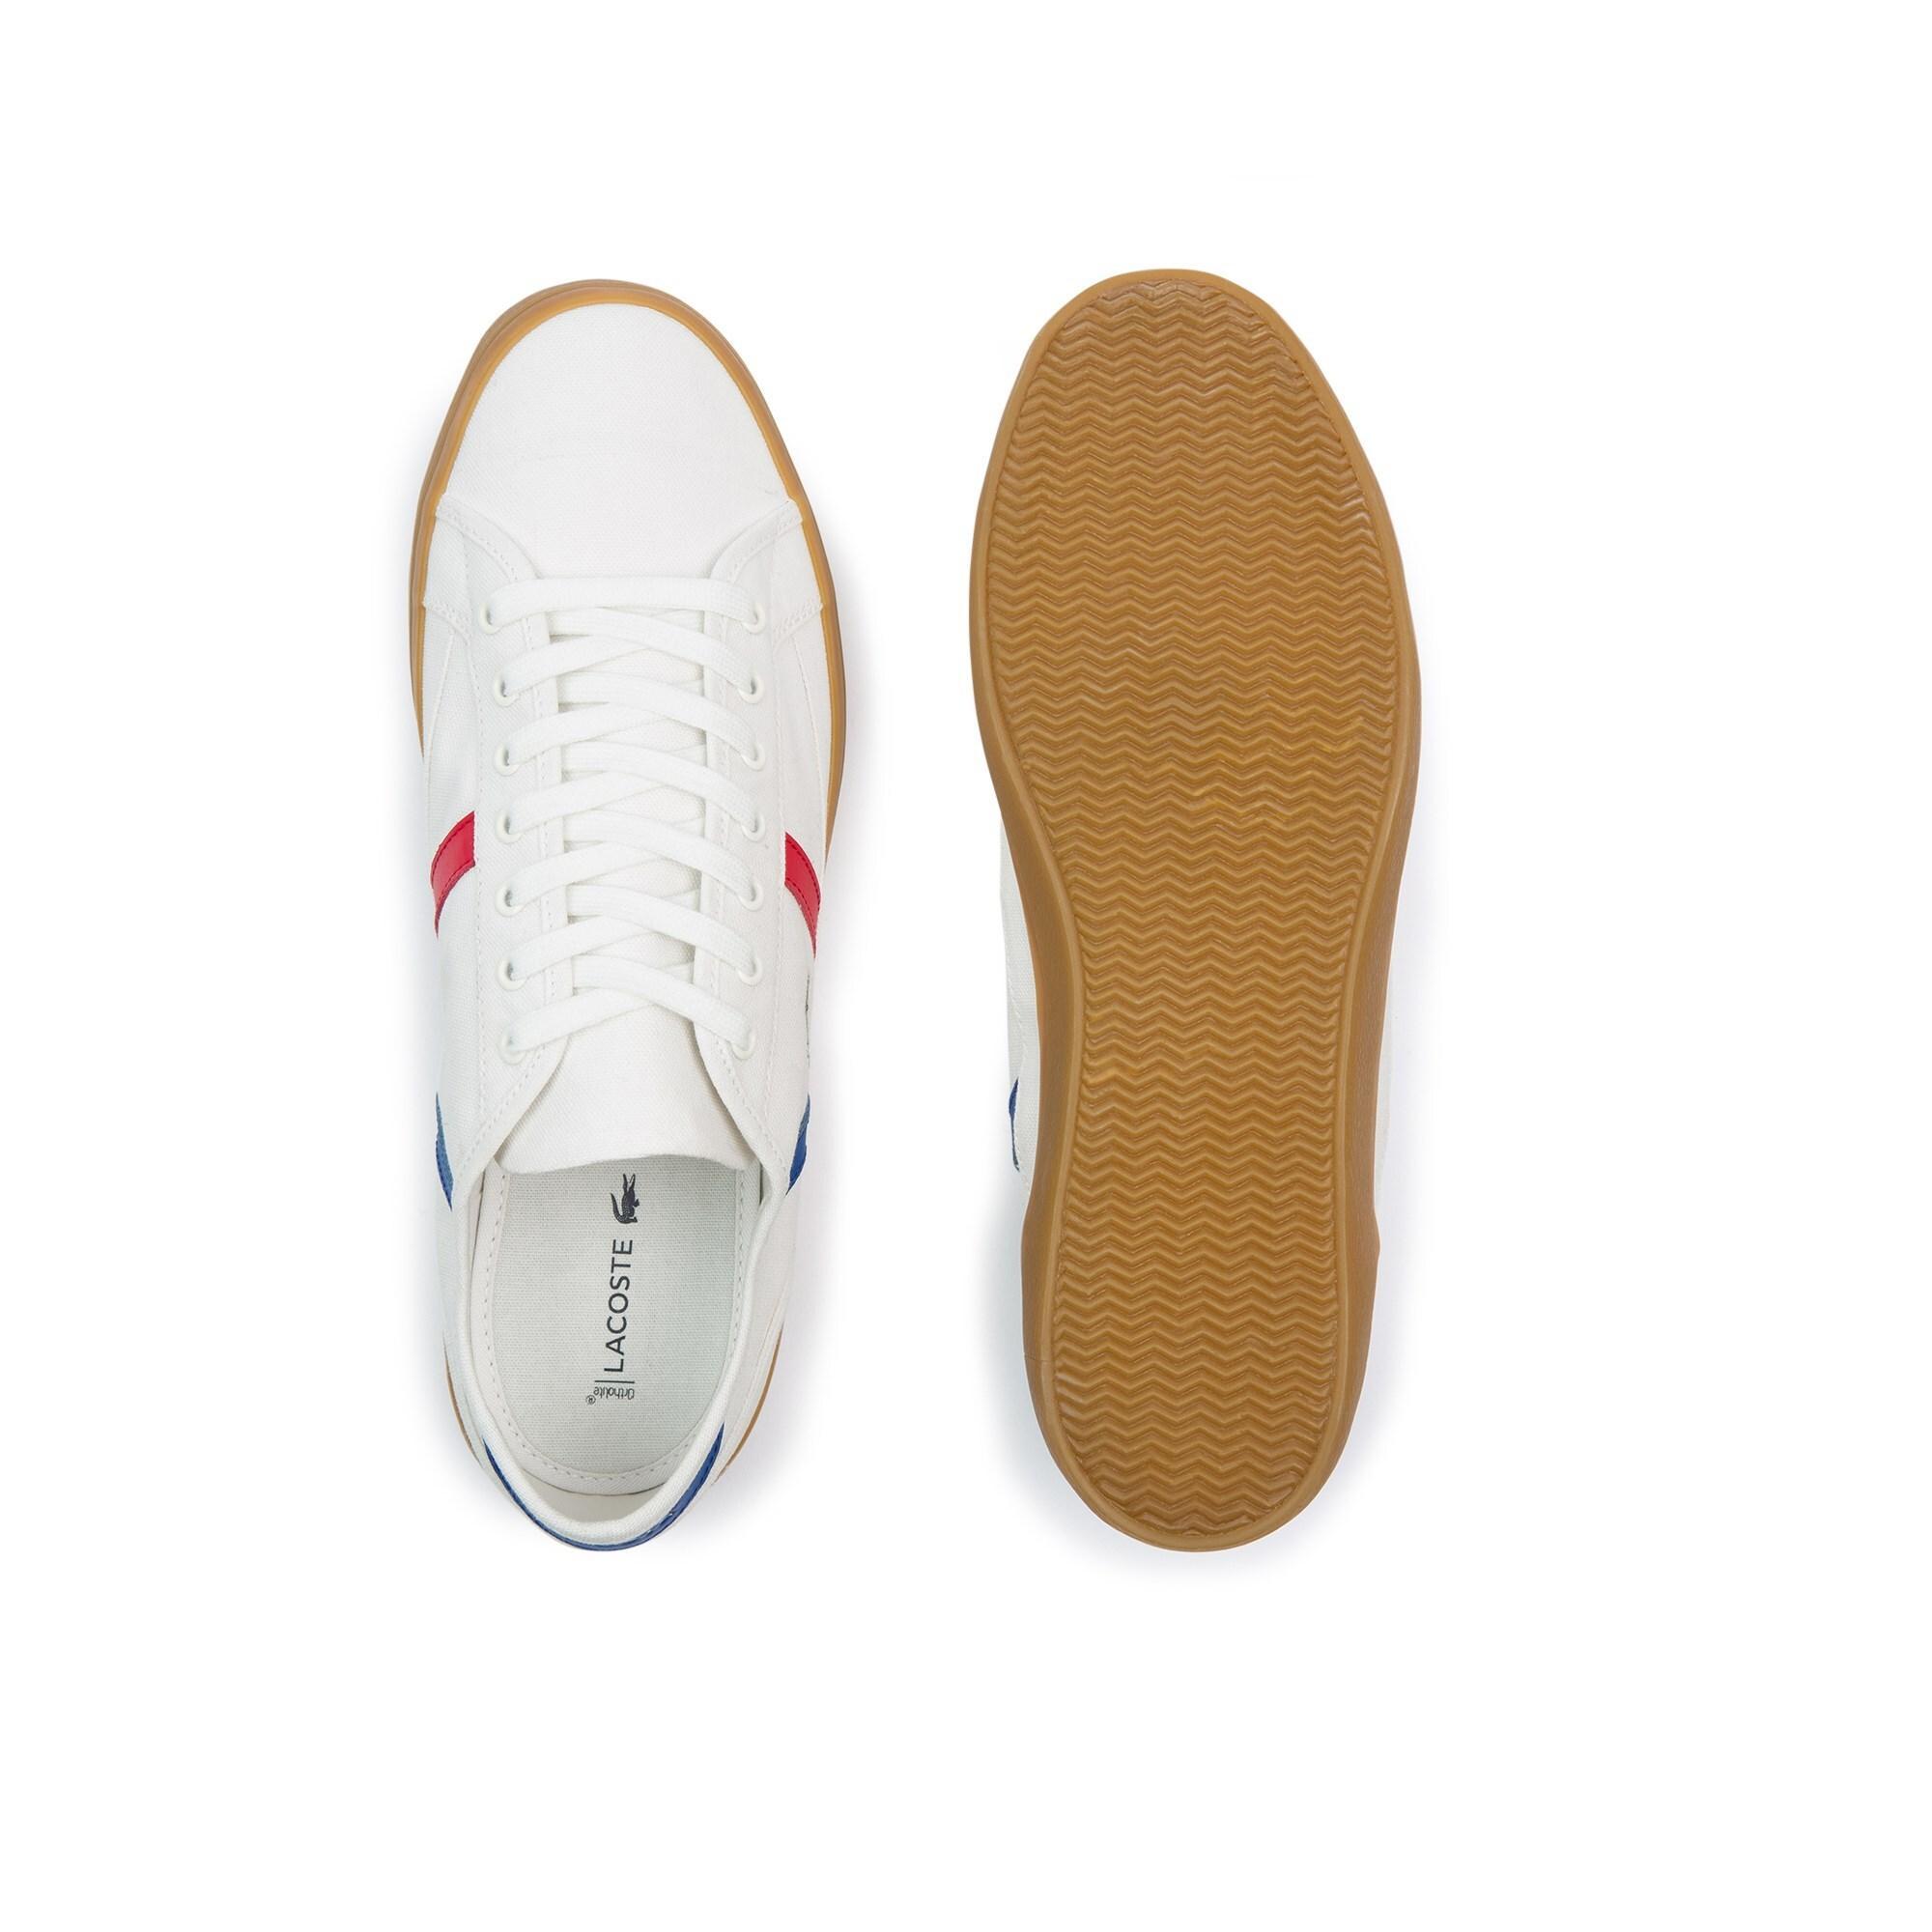 Lacoste Men's Sideline 119 2 Cma Leather Sneakers